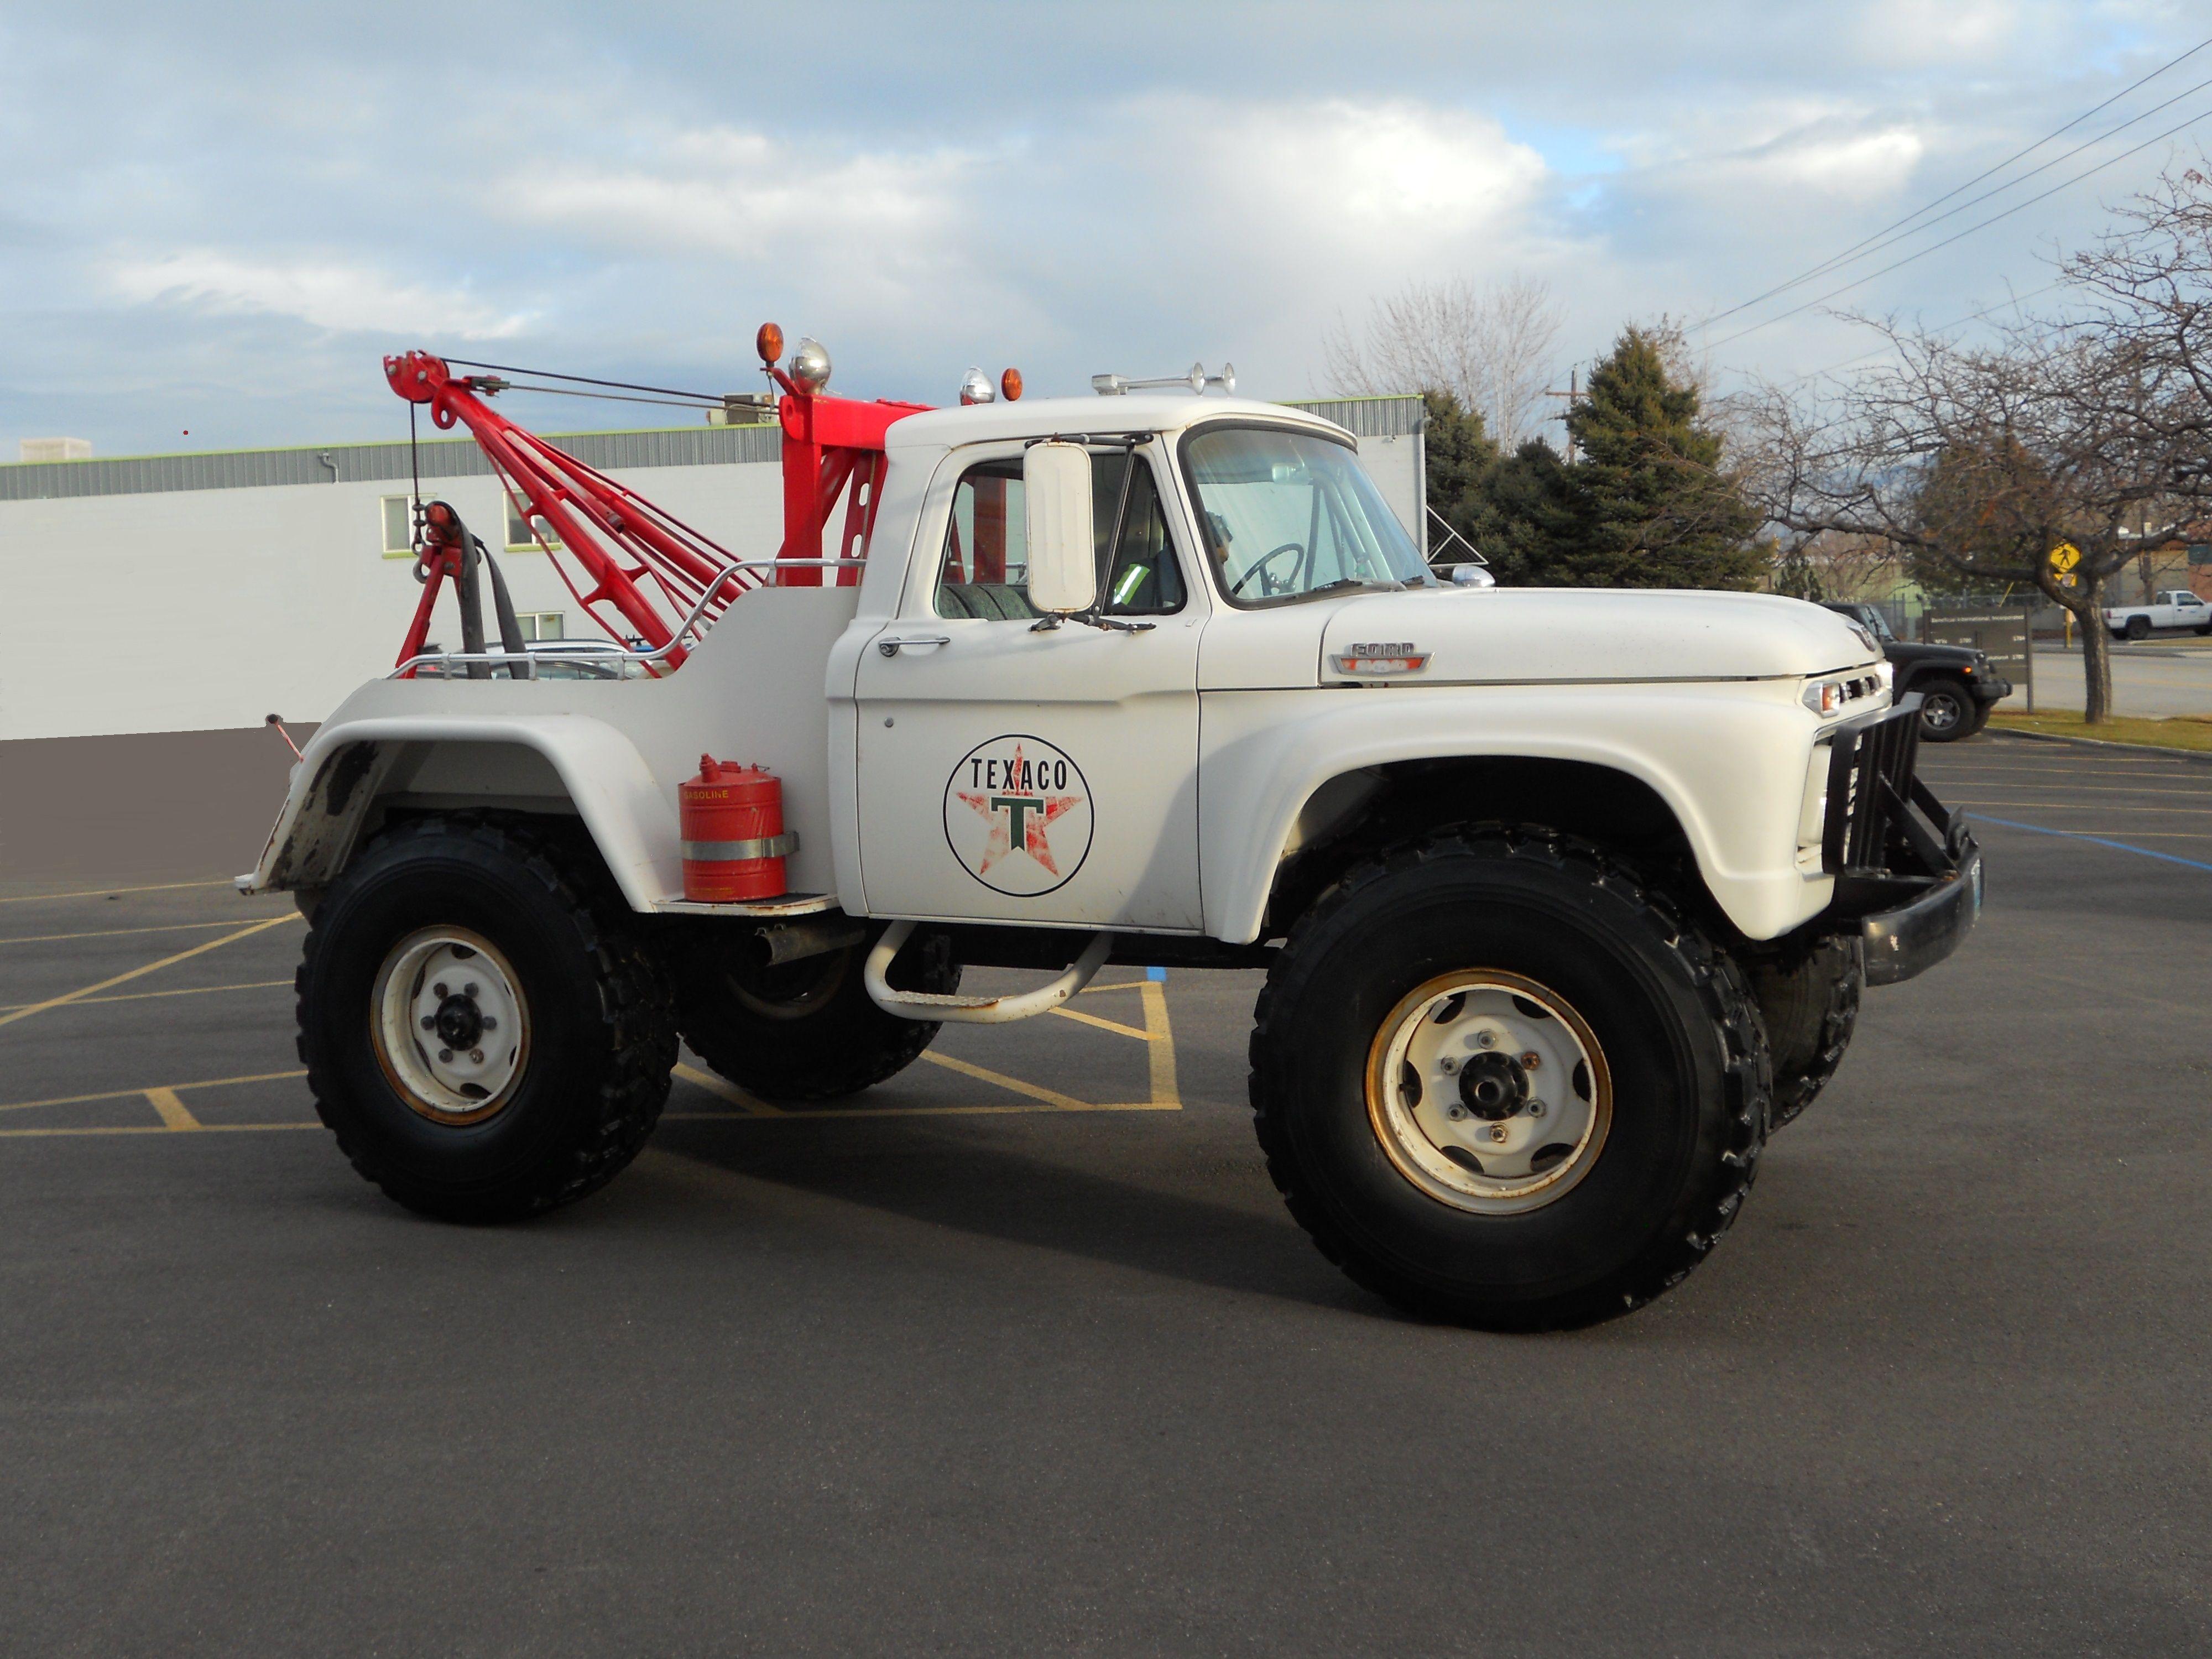 Barn Find All Original Un Restored 1966 Ford F600 4x4 Wrecker Truck Built Custom For Texaco Oil In Wyoming 390 V8 Planetary Ford Trucks Custom Trucks Trucks